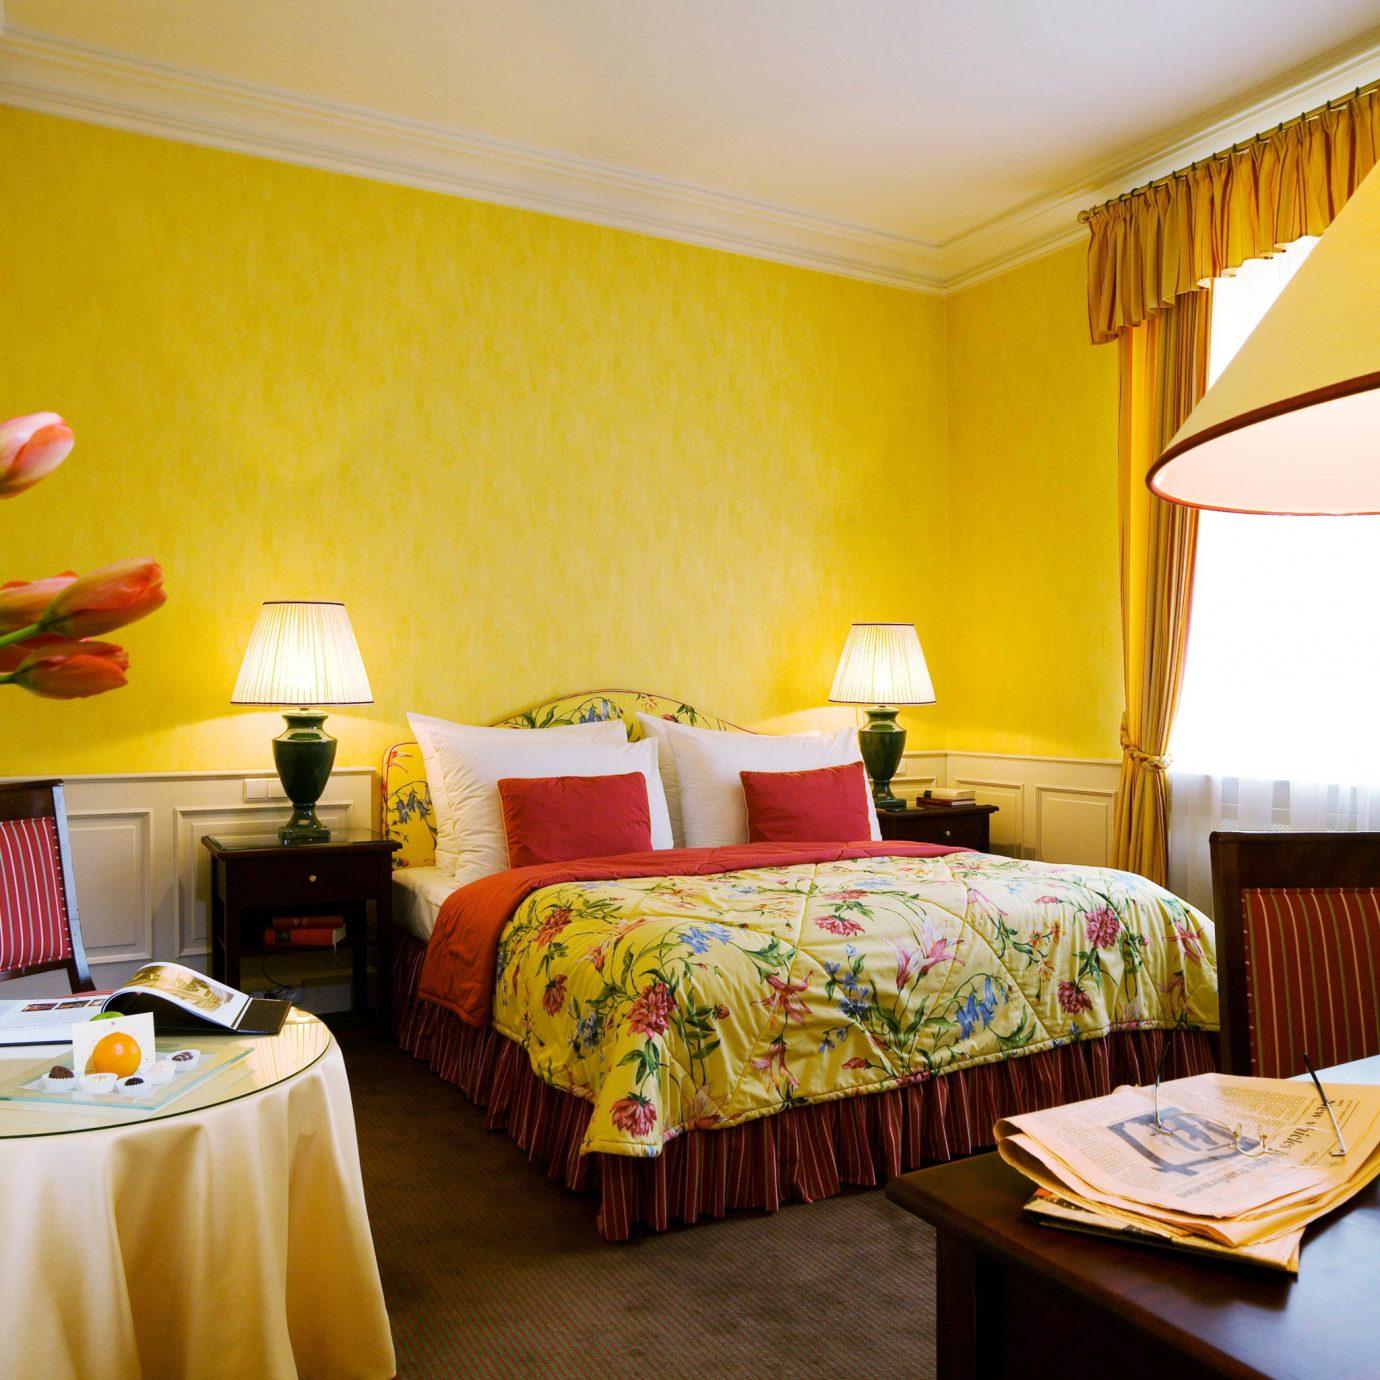 Bedroom City Classic Elegant Historic Suite yellow Resort cottage Villa bright